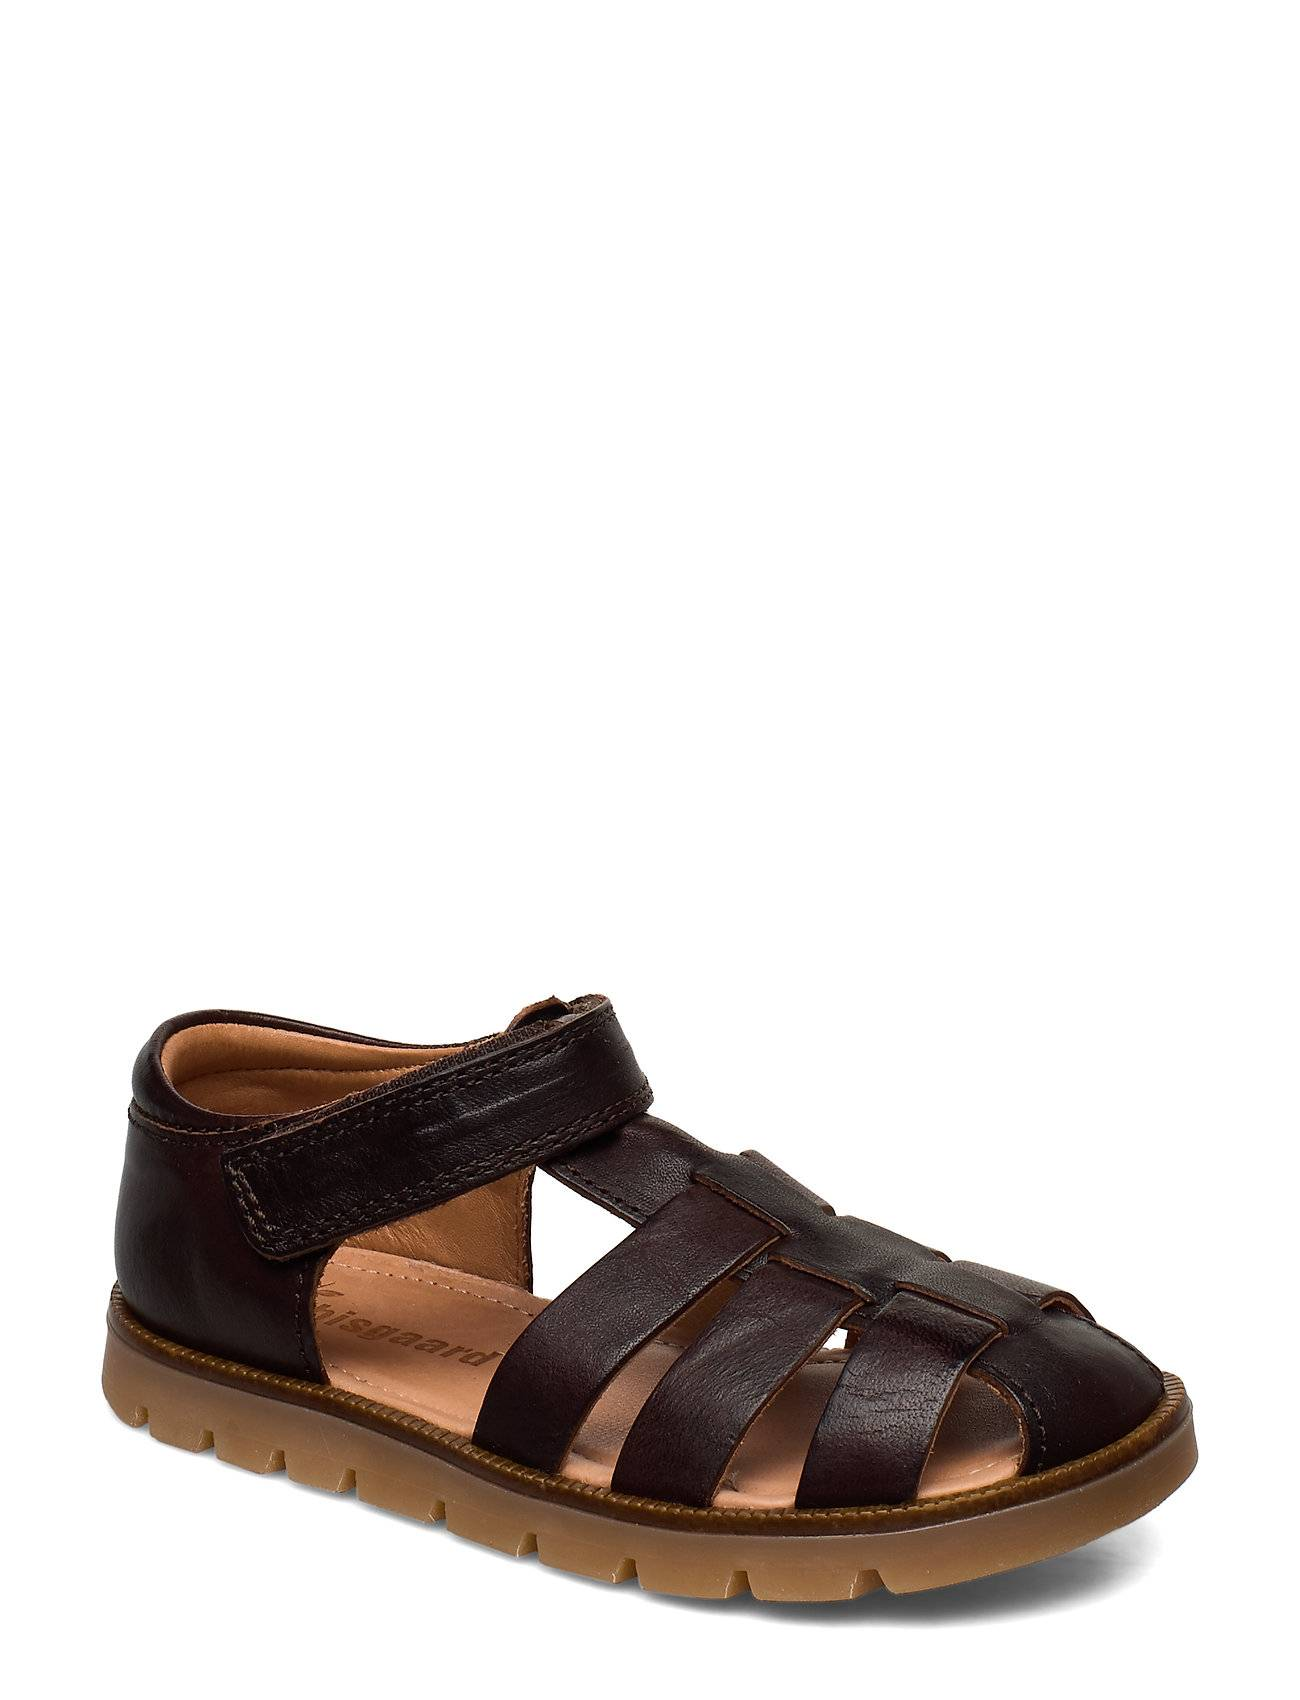 Bisgaard Beka Shoes Summer Shoes Sandals Ruskea Bisgaard